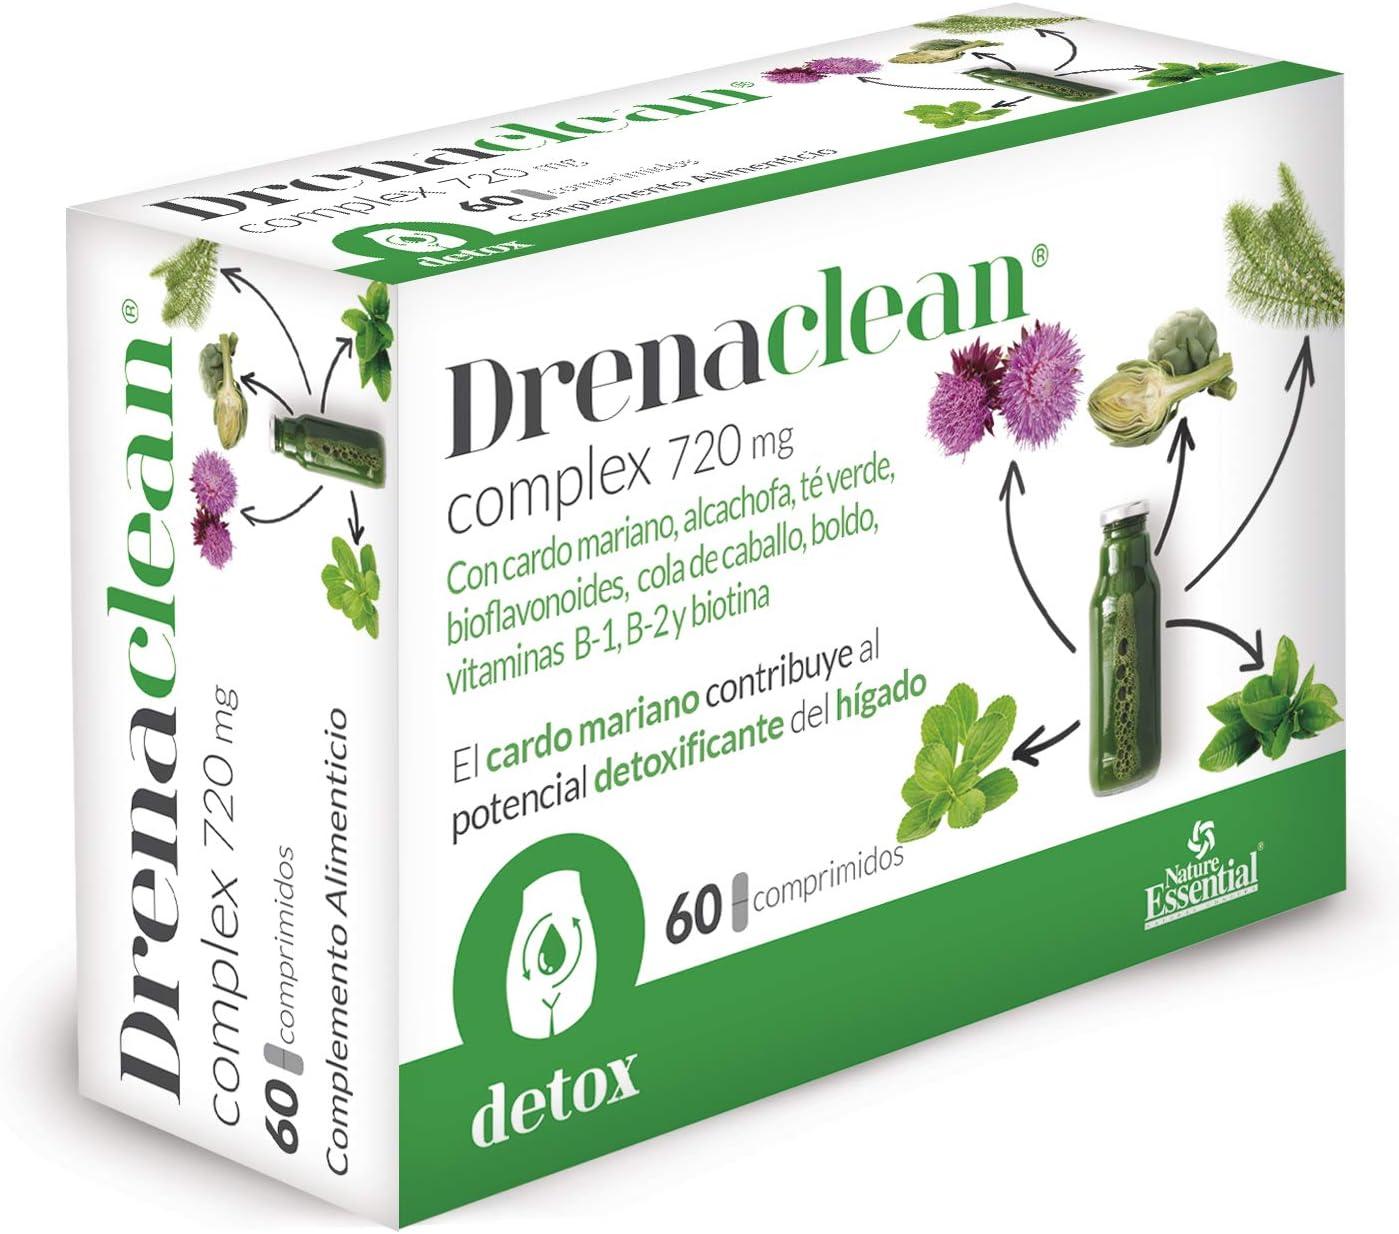 Drenaclean® 720 mg 60 comprimidos con cardo mariano, alcachofa, bioflavonoides, té verde, cola de caballo, boldo, vitamina B-2, B-1 y Biotina.